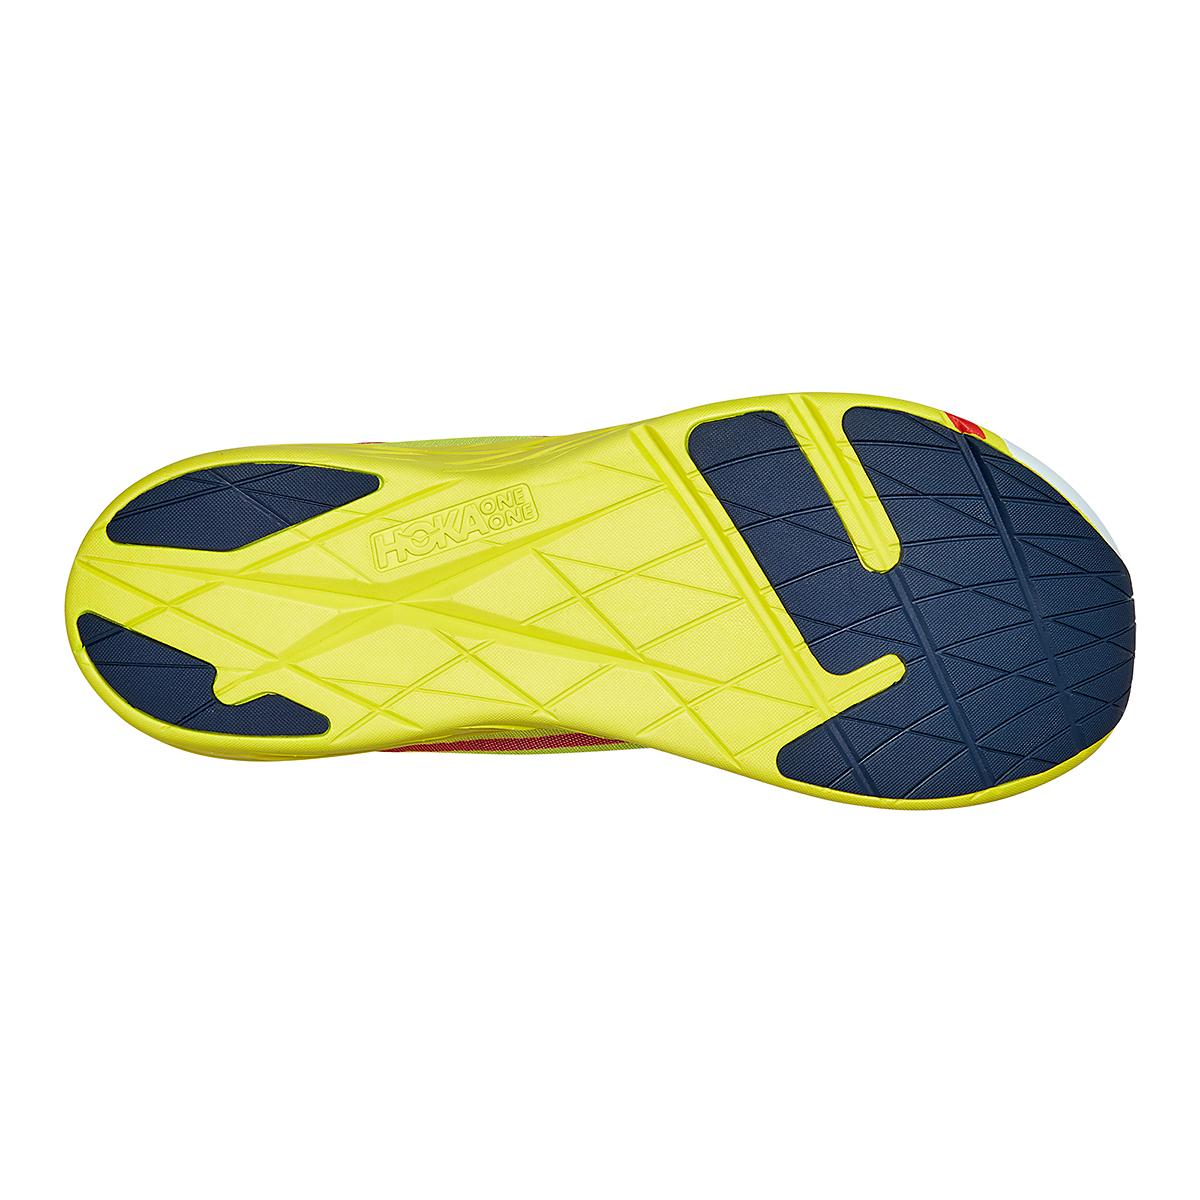 Men's Hoka One One Rocket X Running Shoe - Color: White/Evening Primrose - Size: 8.5 - Width: Regular, White/Evening Primrose, large, image 6